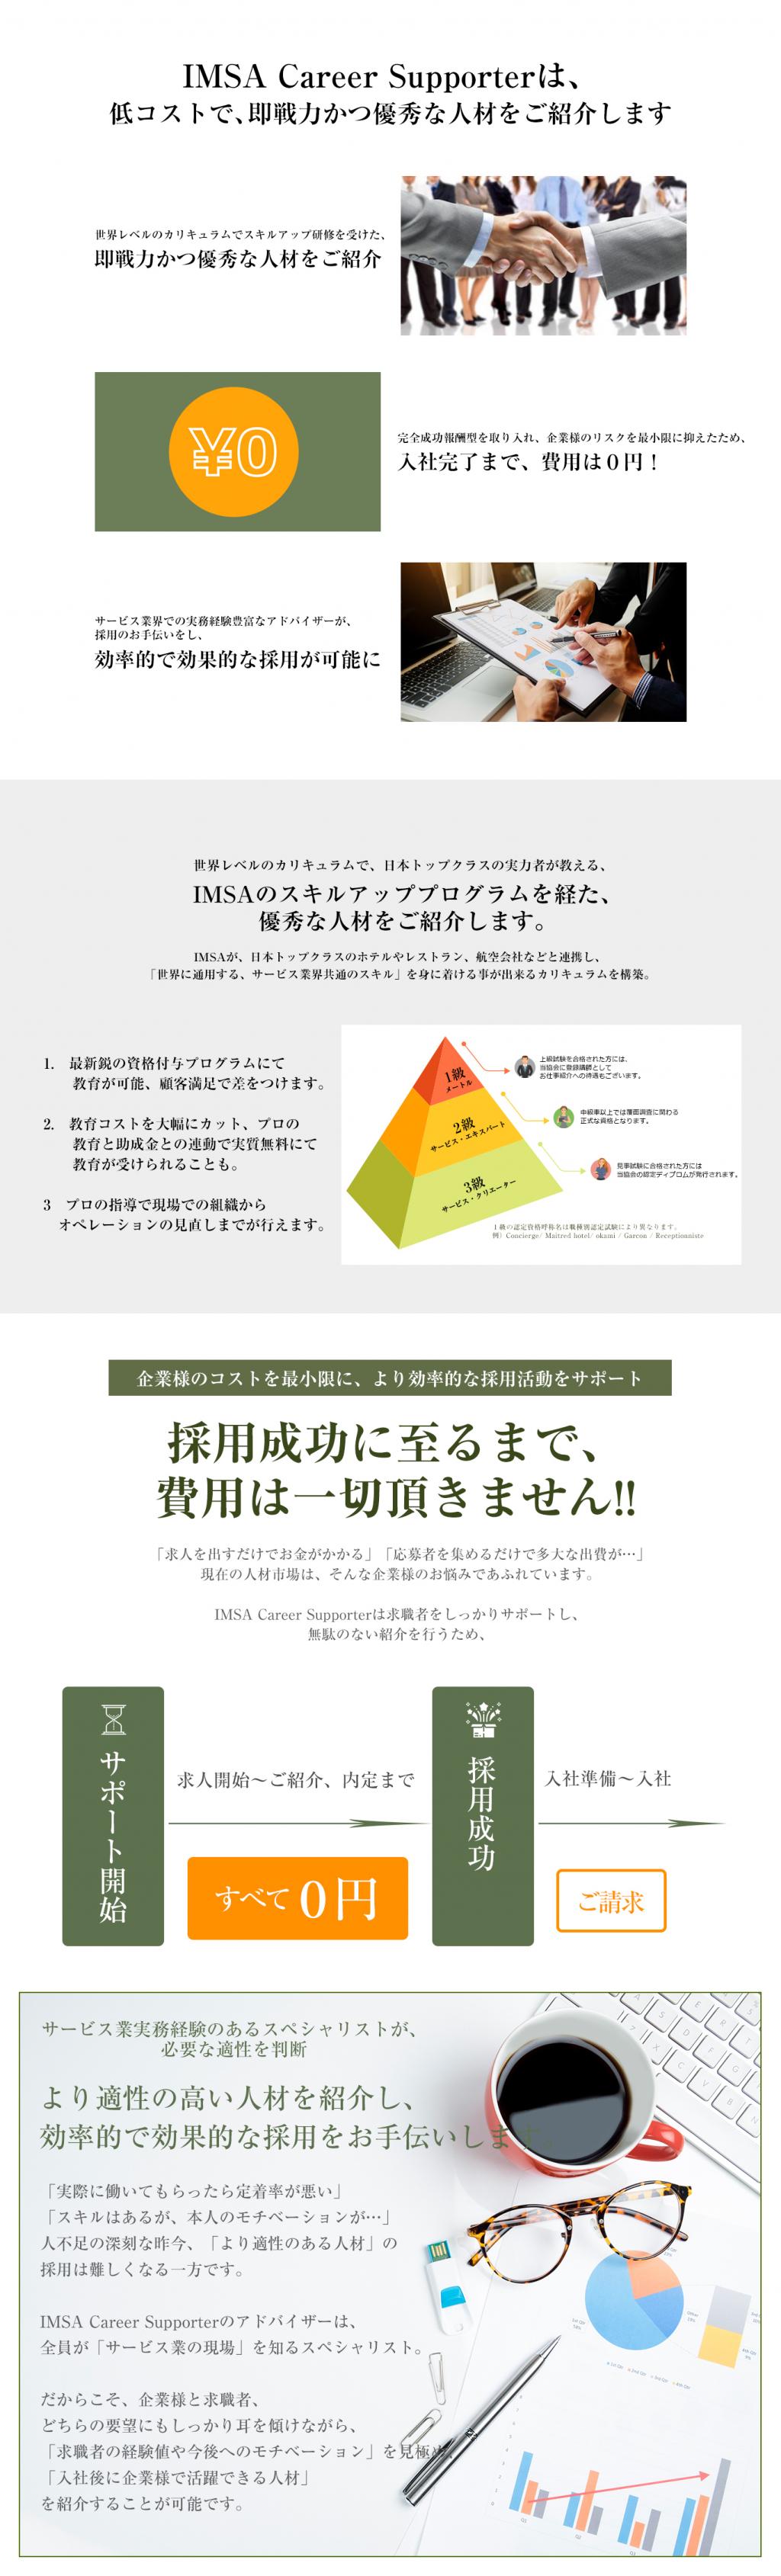 http://imsacareer.net/img/sites/imsa-services/top3.jpg